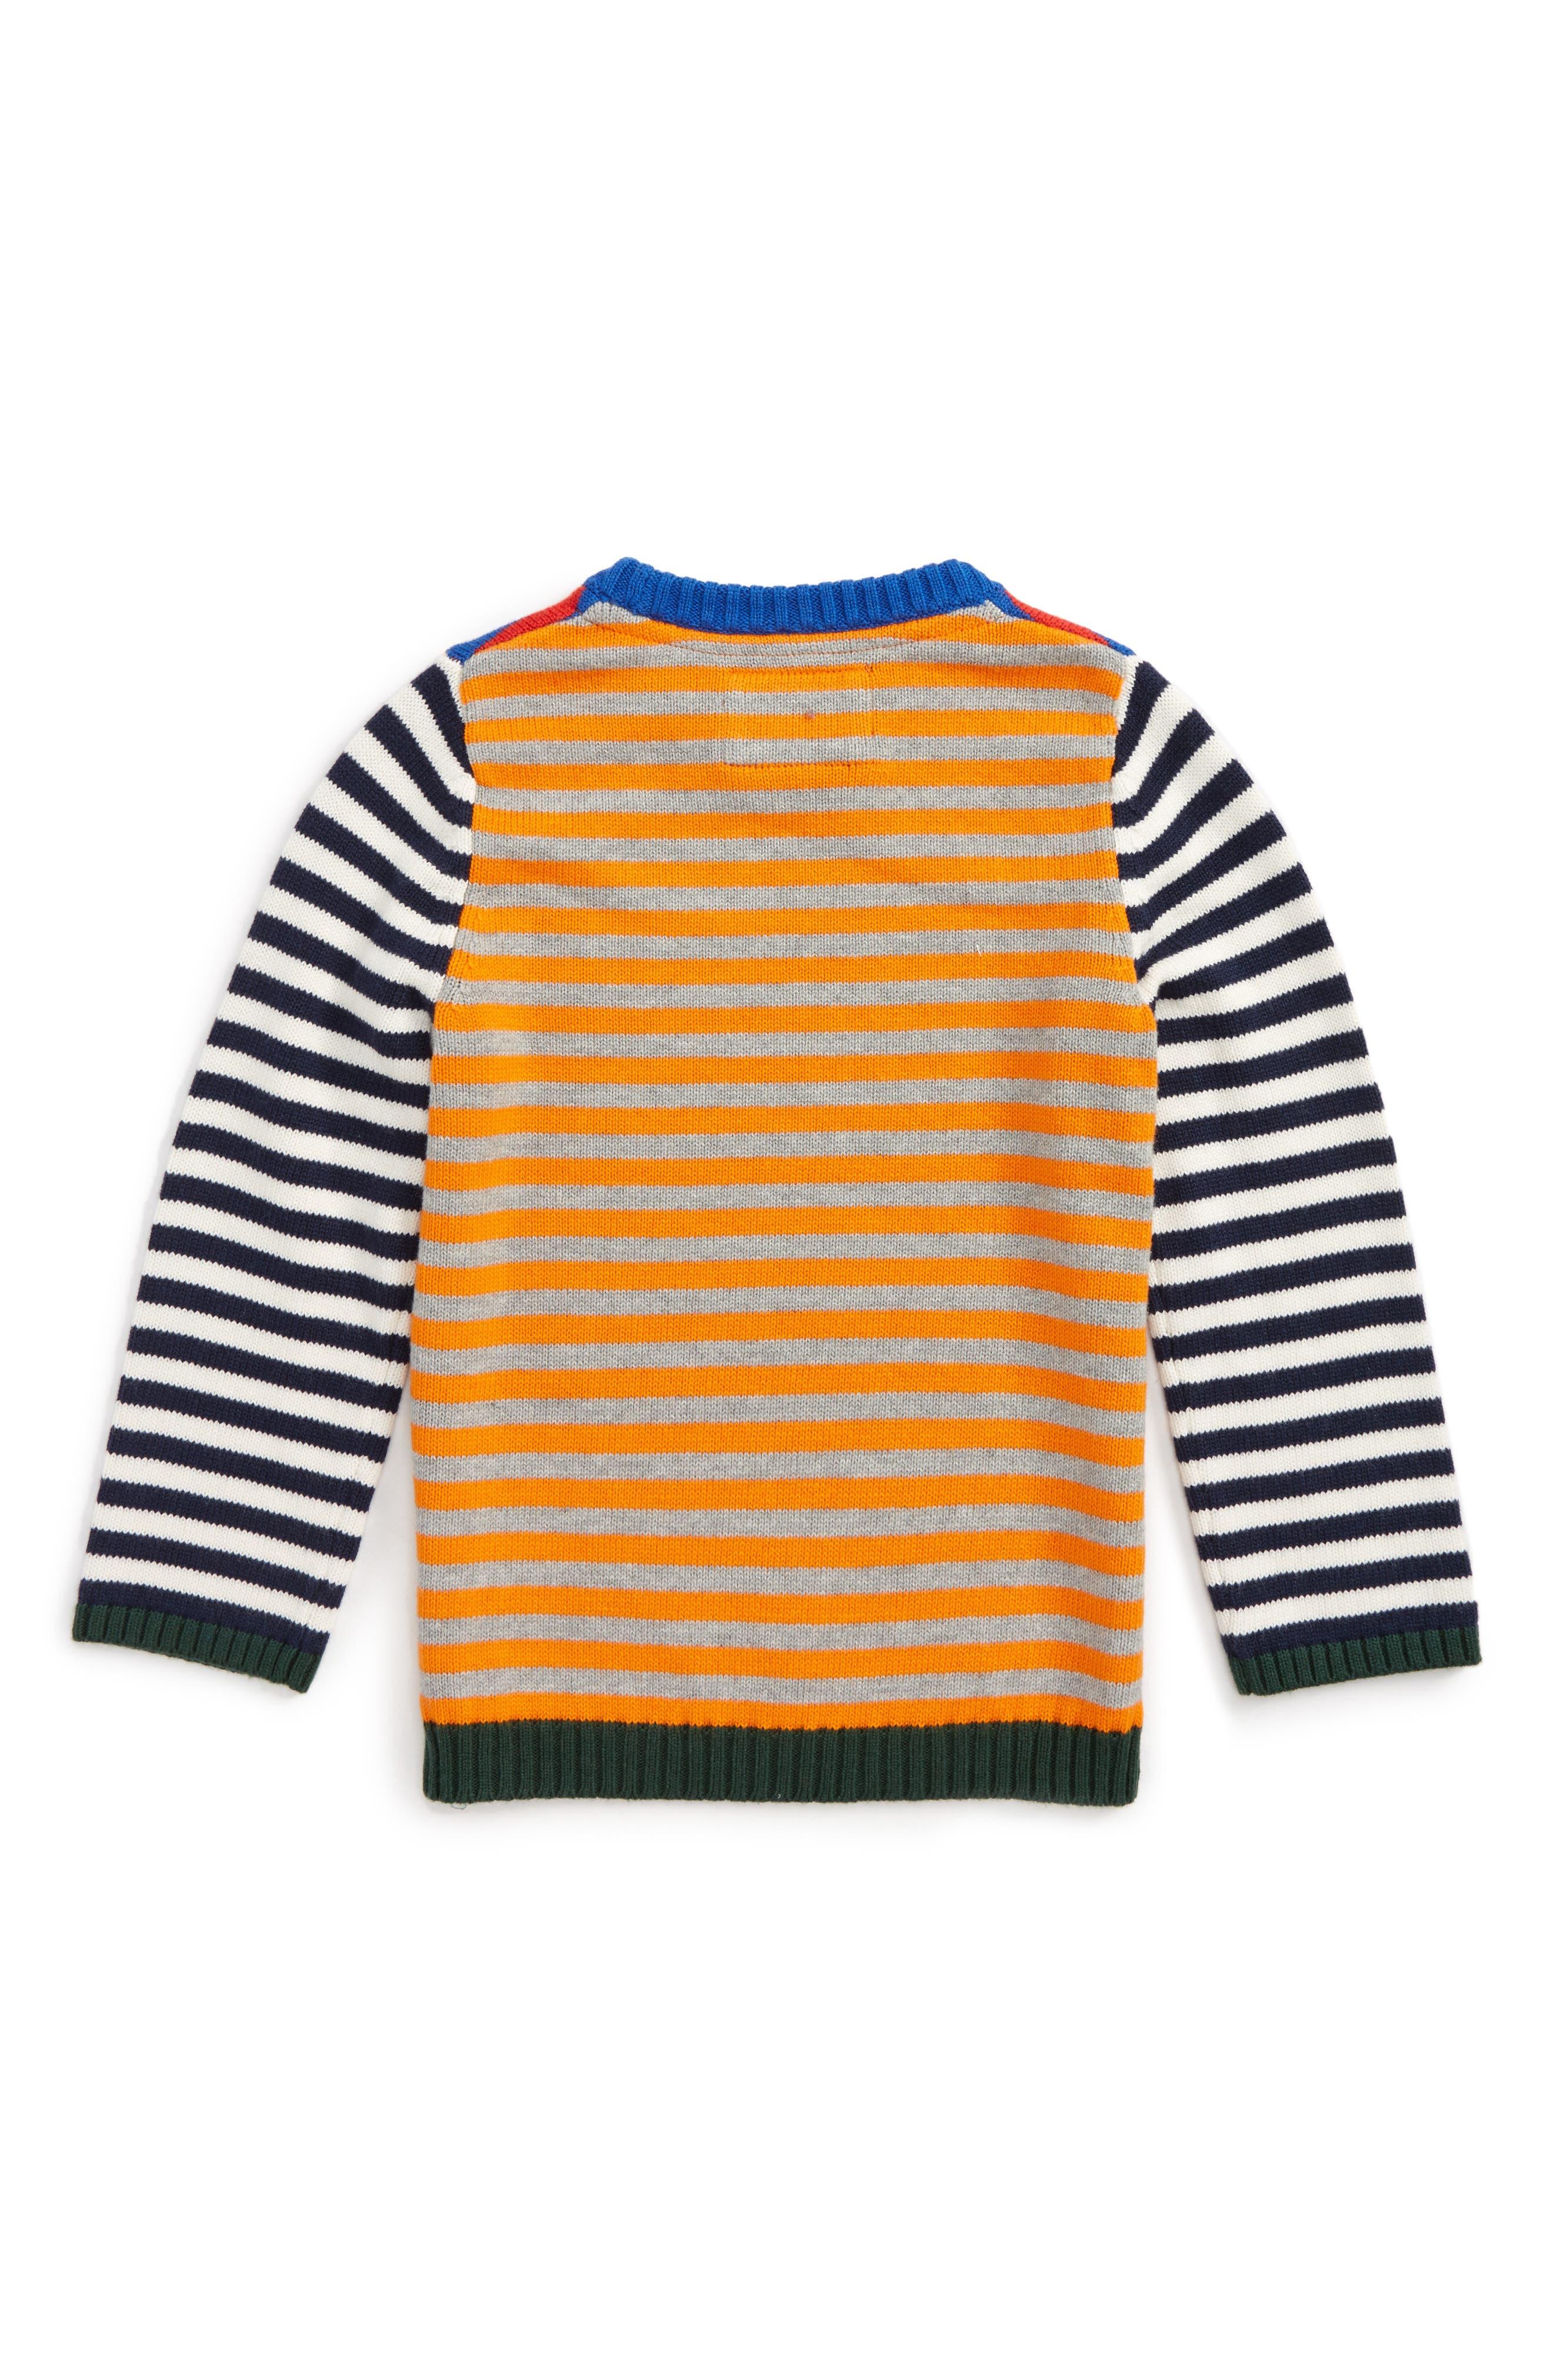 Alternate Image 2  - Mini Boden Hotchpotch Sweater (Toddler Boys, Little Boys & Big Boys)